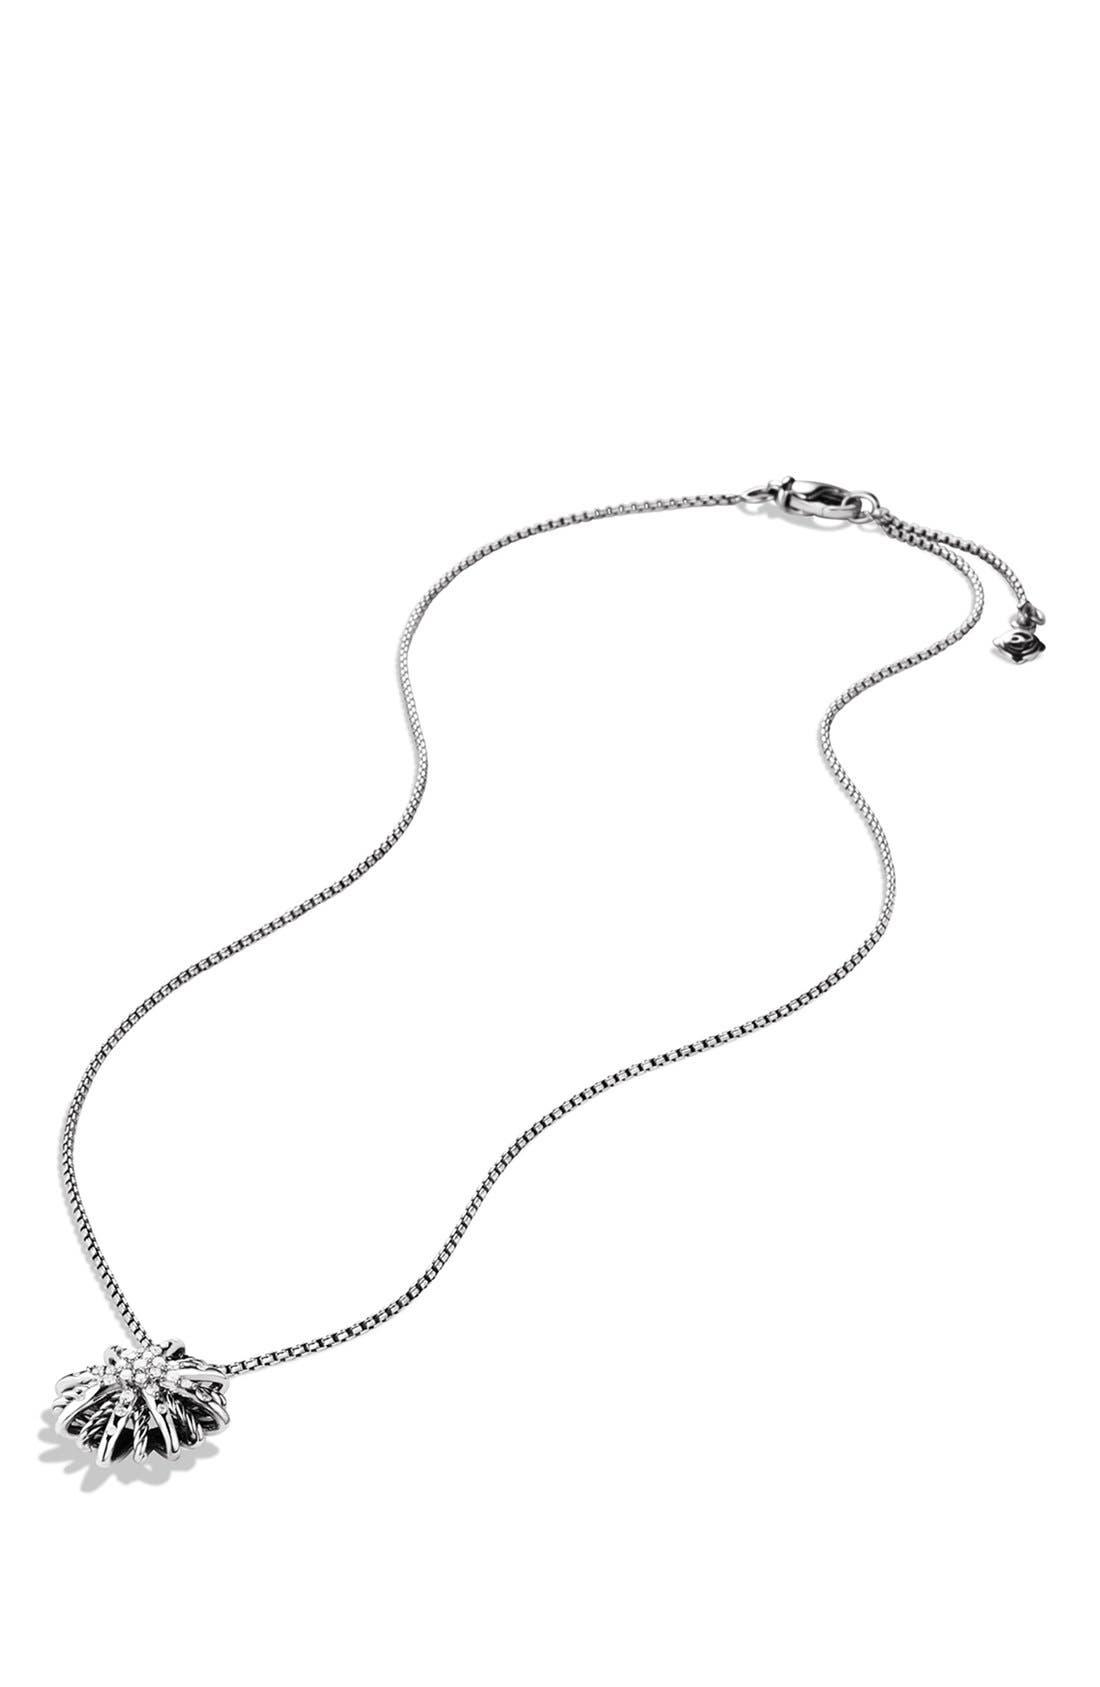 'Starburst' Small Pendant with Diamonds on Chain,                             Alternate thumbnail 2, color,                             DIAMOND